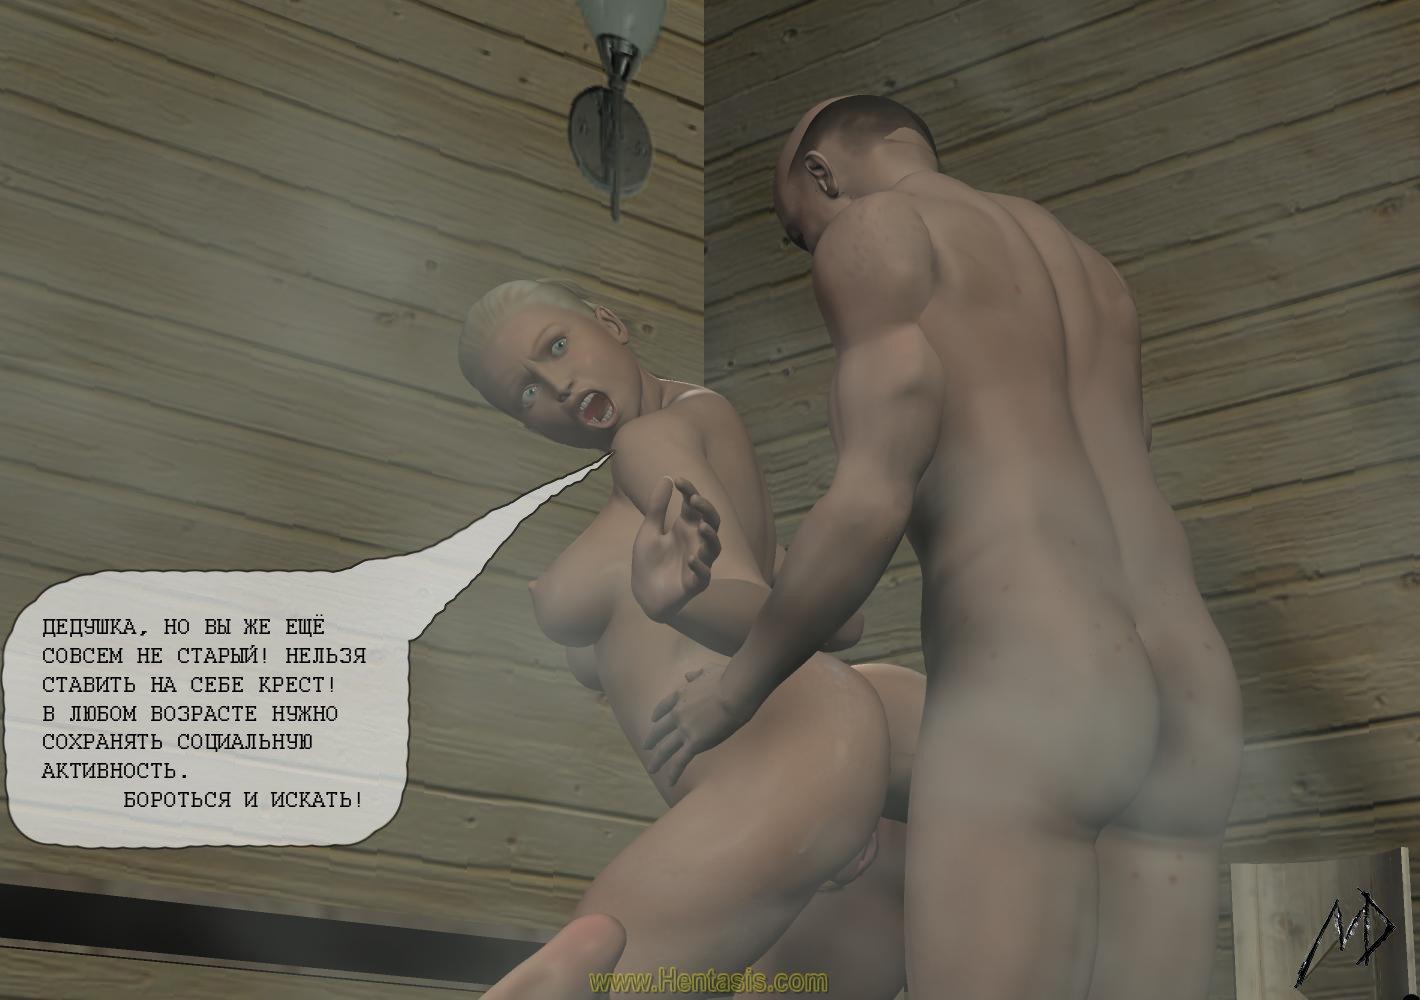 Эро рассказ инцест баня 4 фотография